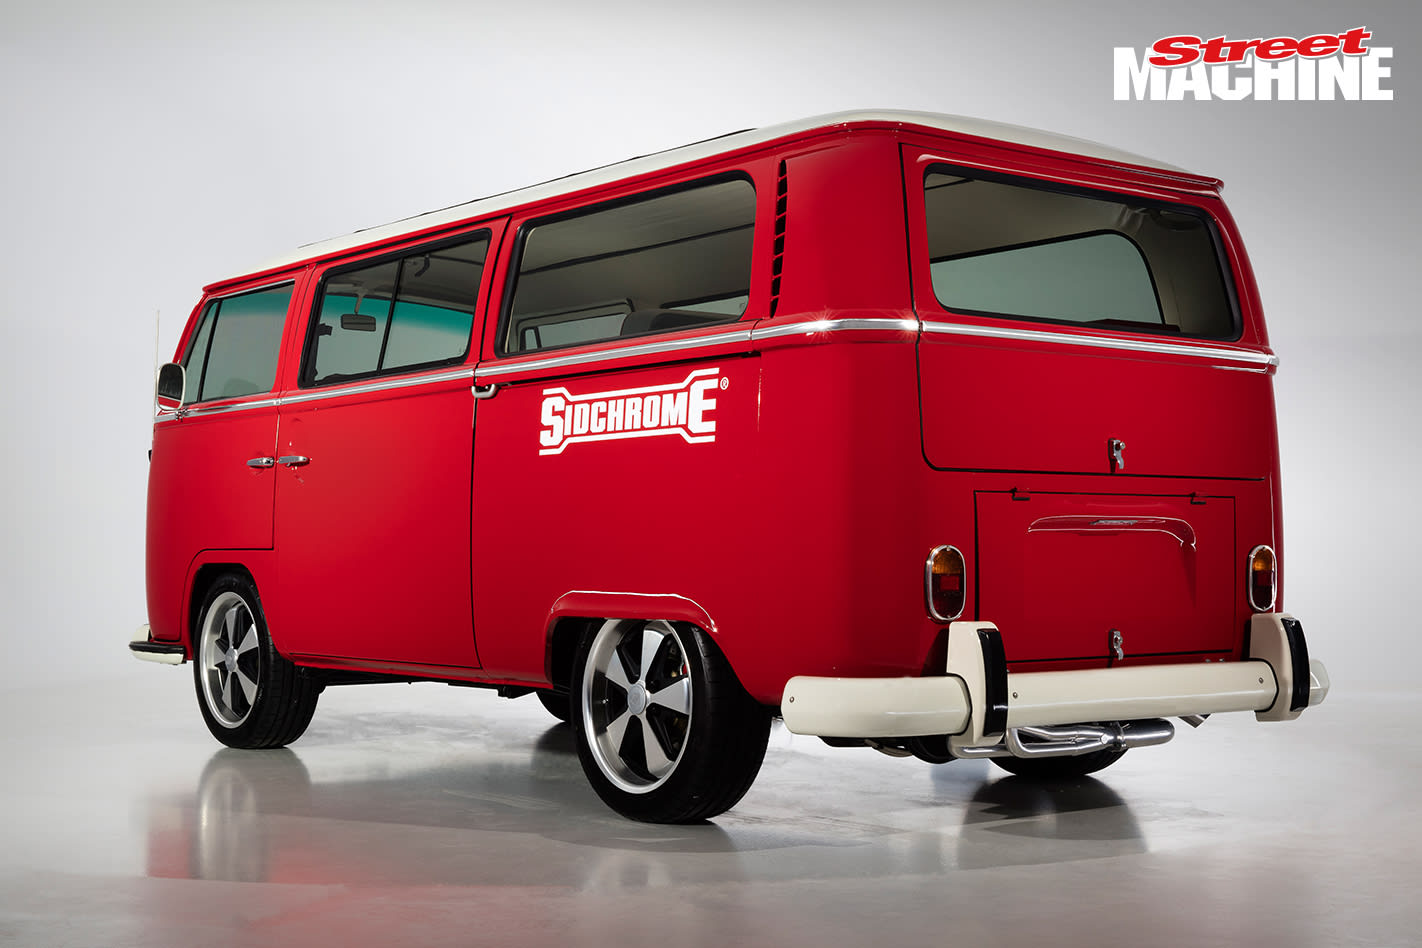 VW Kombi Sidchrome Nw